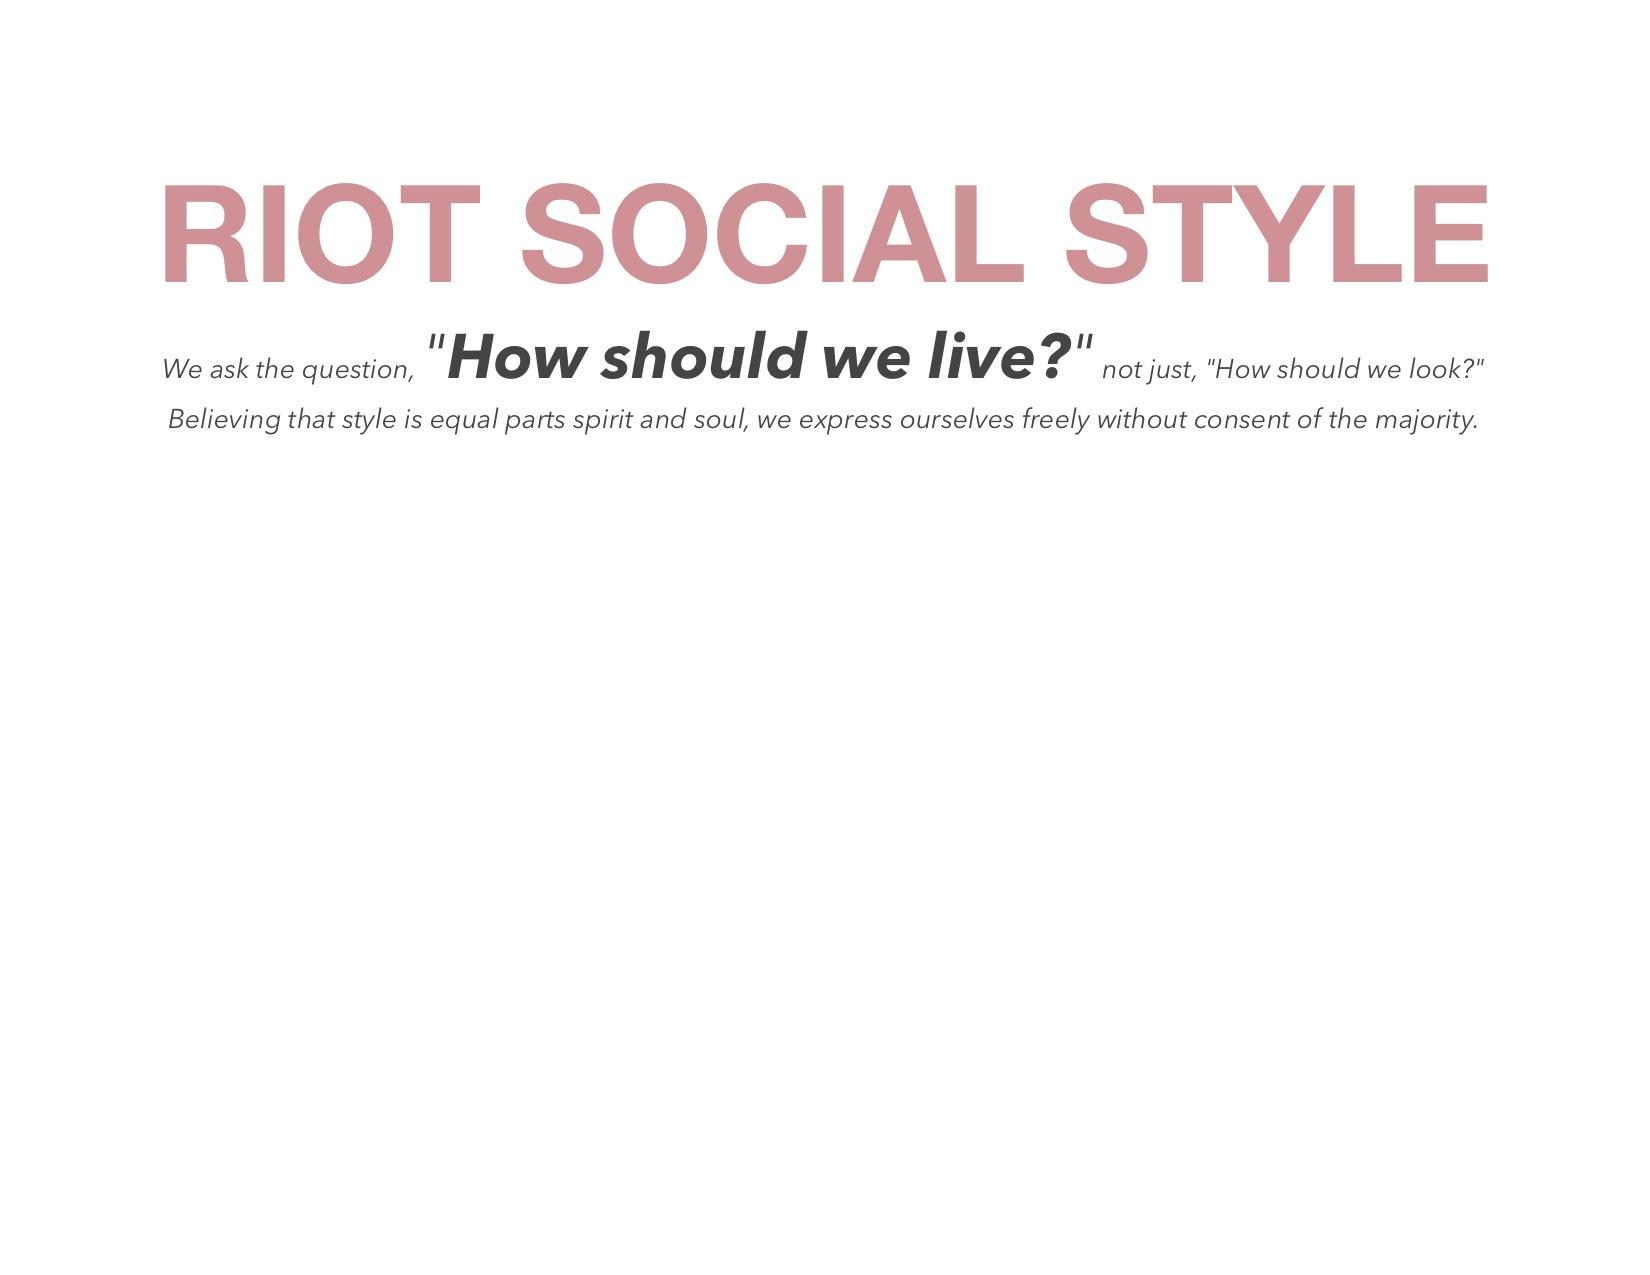 66984a0834 Riot Social Style presents